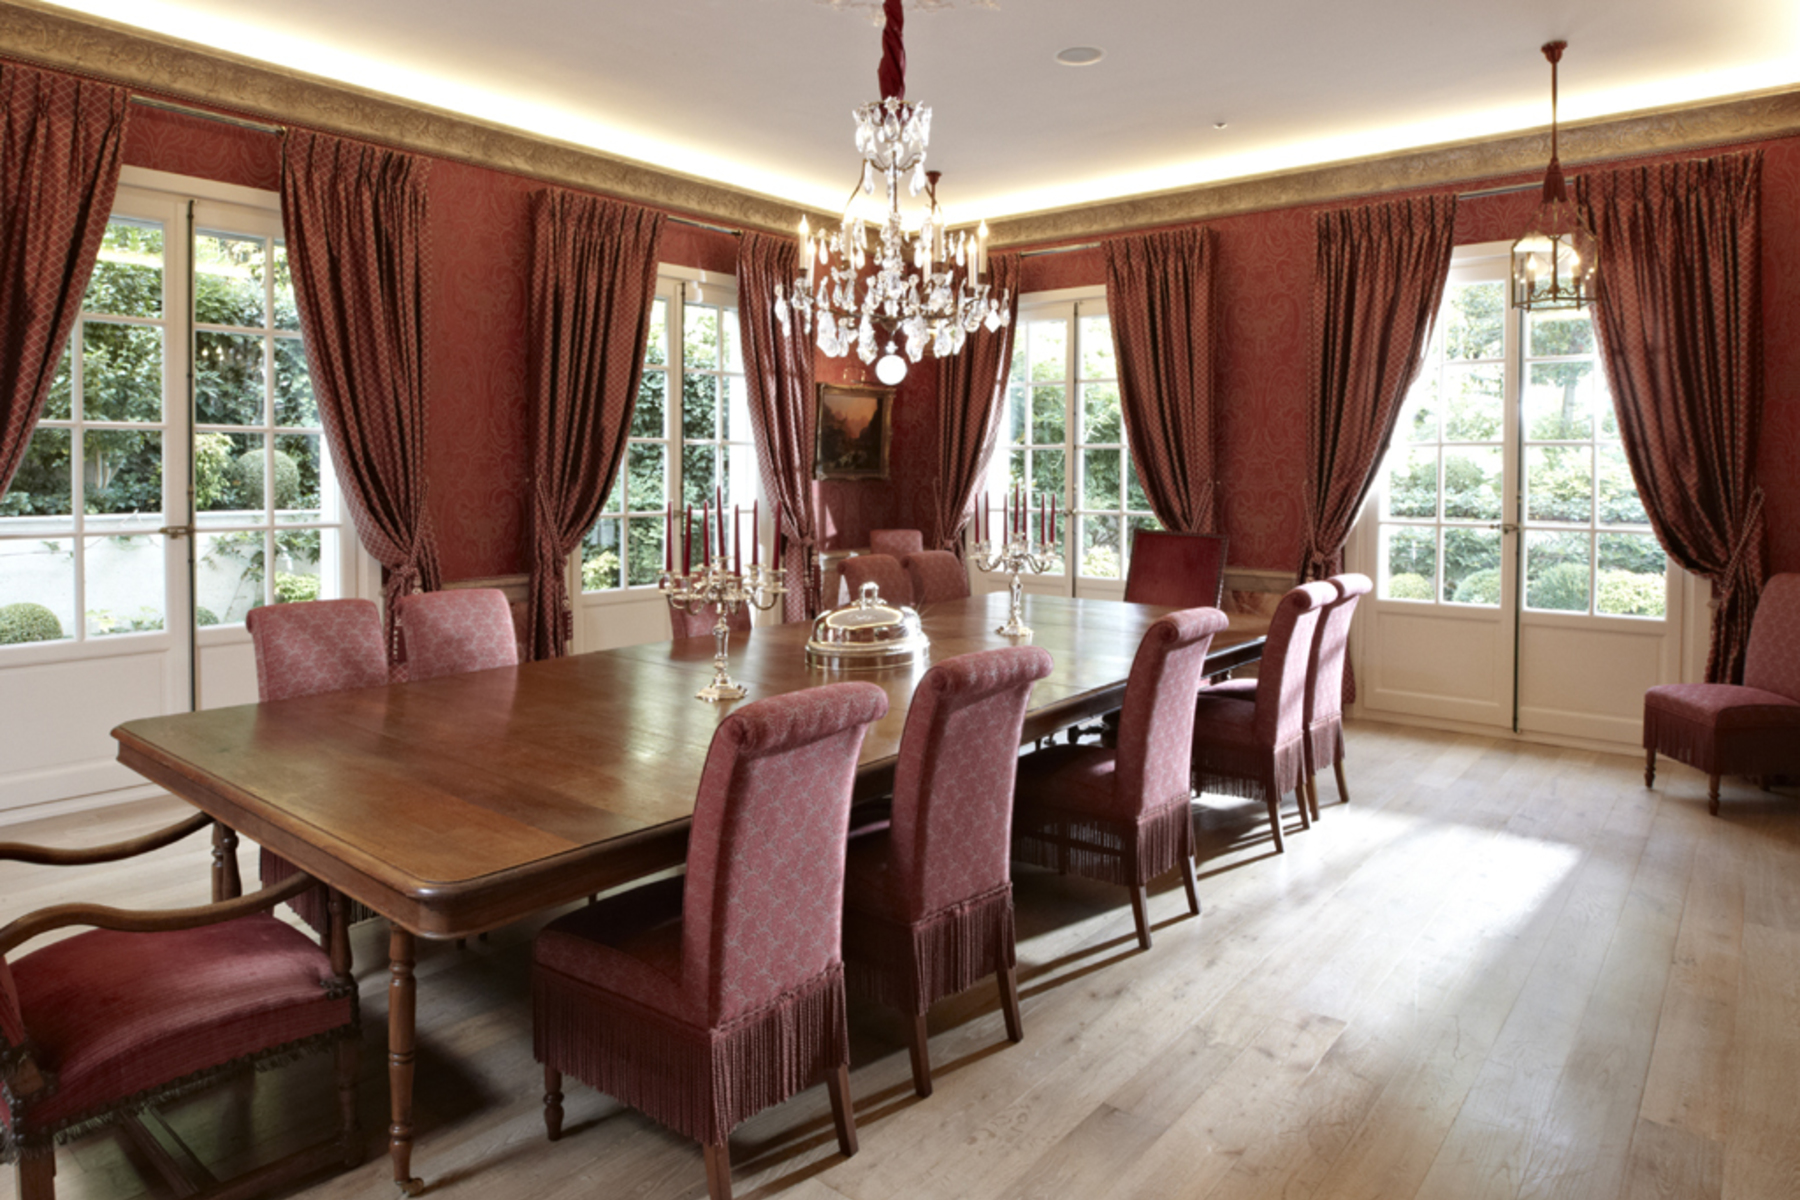 Additional photo for property listing at Superb mansion close to Denantou park Lausanne Lausana, Vaud 1006 Suiza